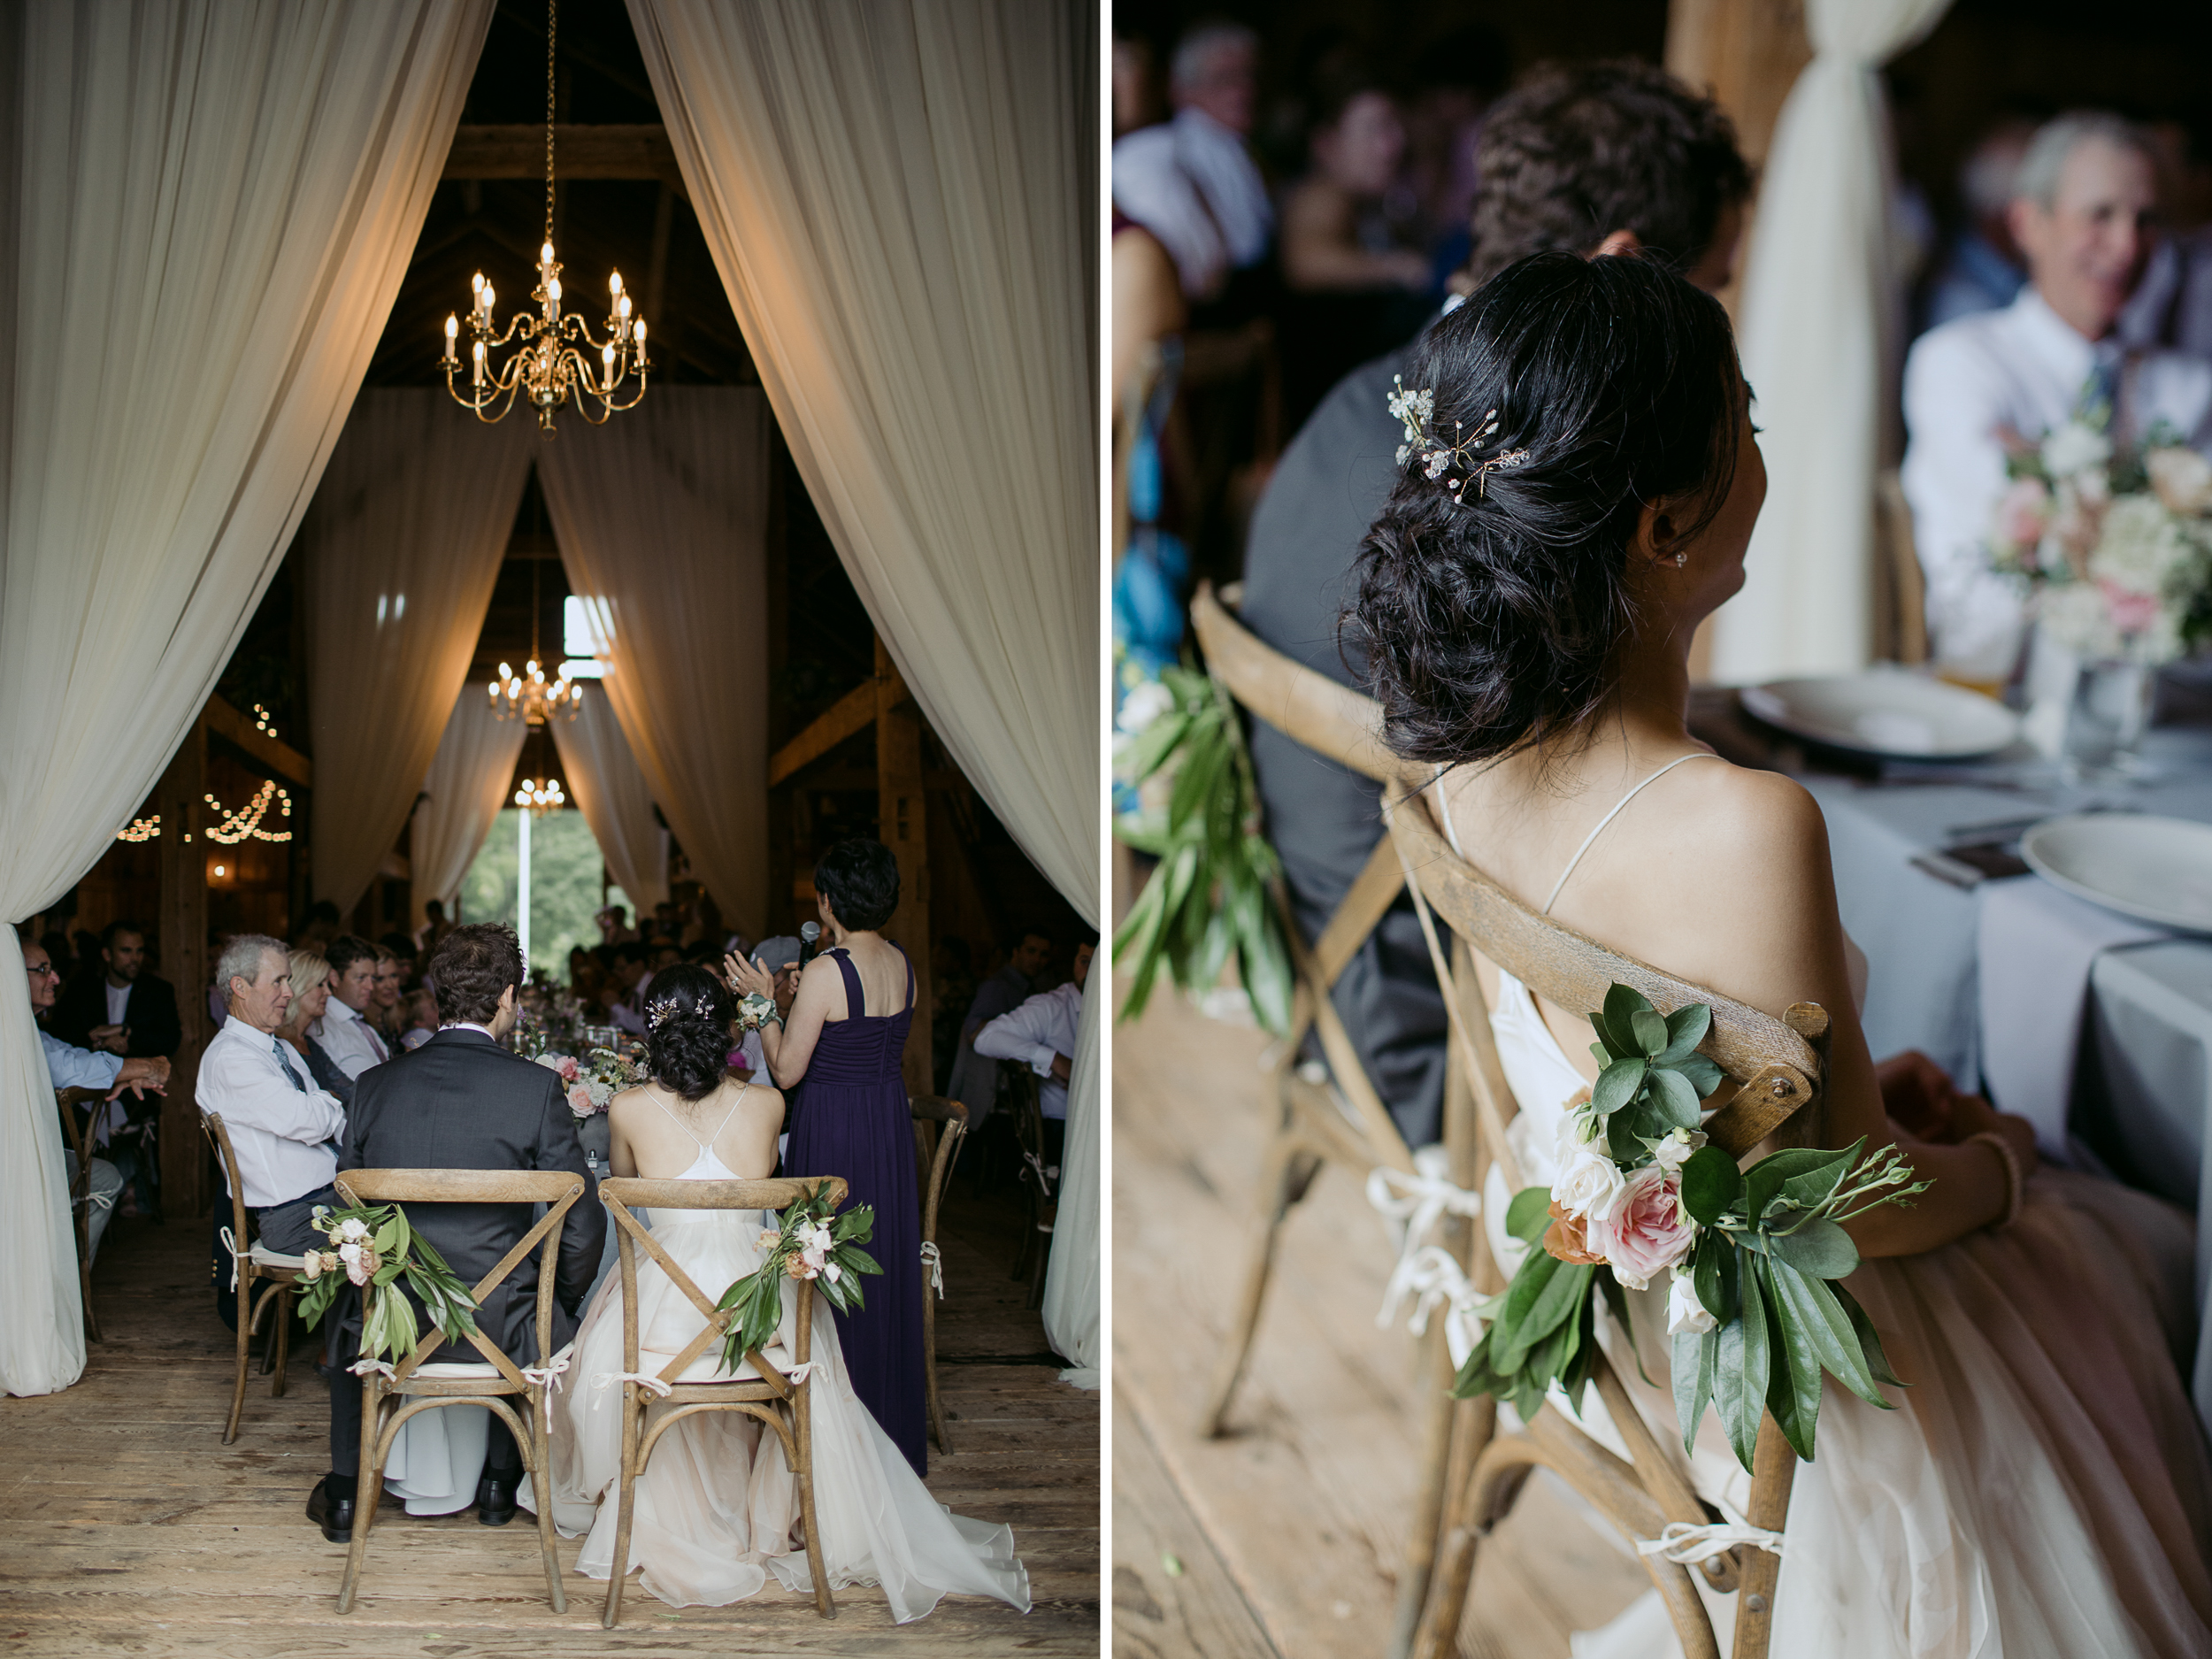 william_allen_farm_wedding_pownal_maine_ilkatayler-34.jpg